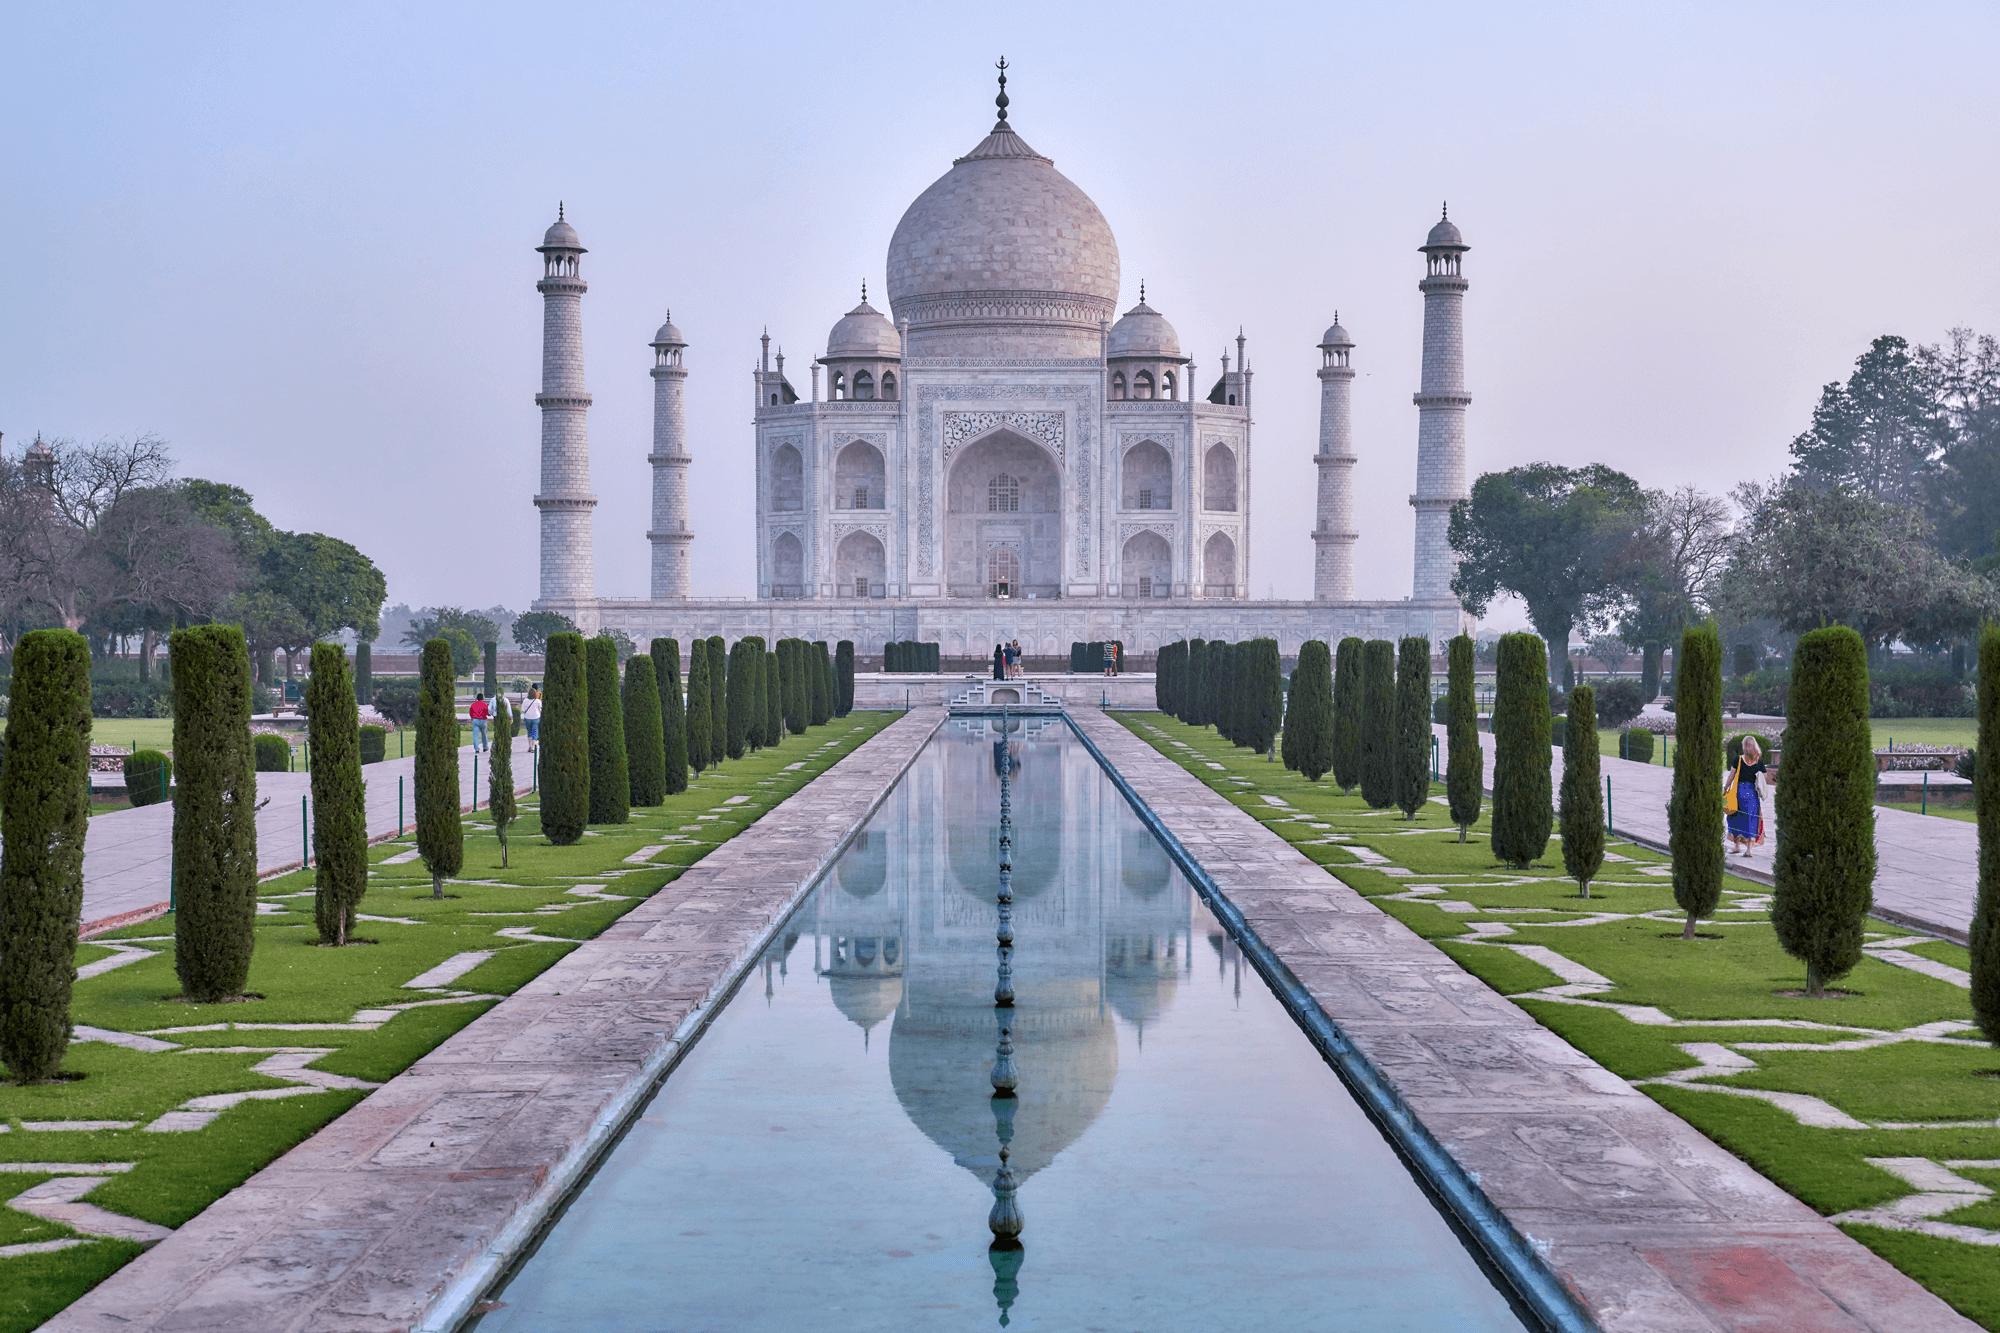 Daan van Beek teaches successful masterclasses in India | Training